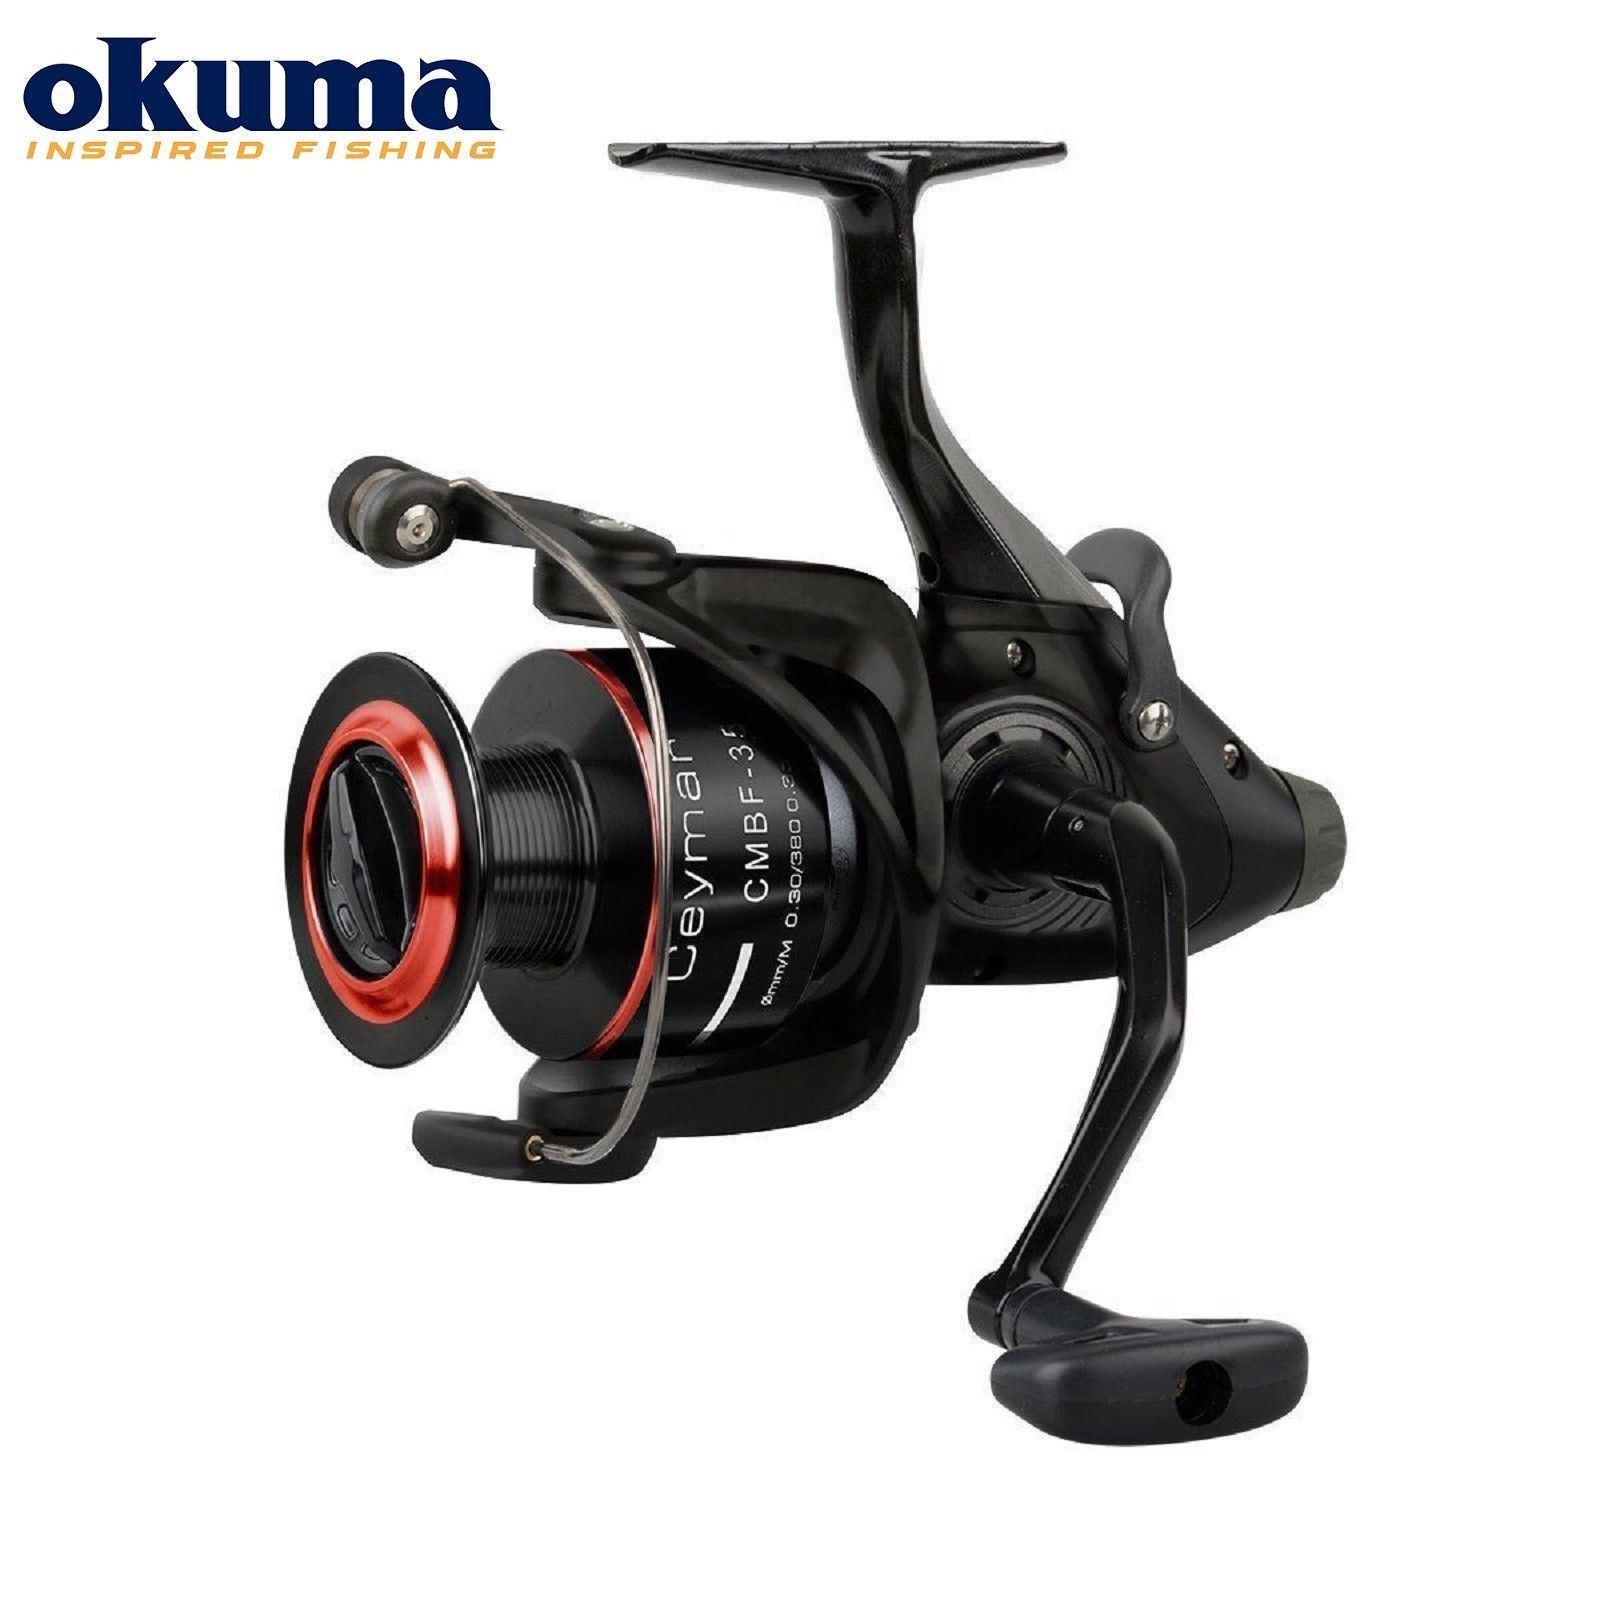 Okuma ceymar caitfeeder carp fishing reel cmbf 330-cmbf 365 various Größes